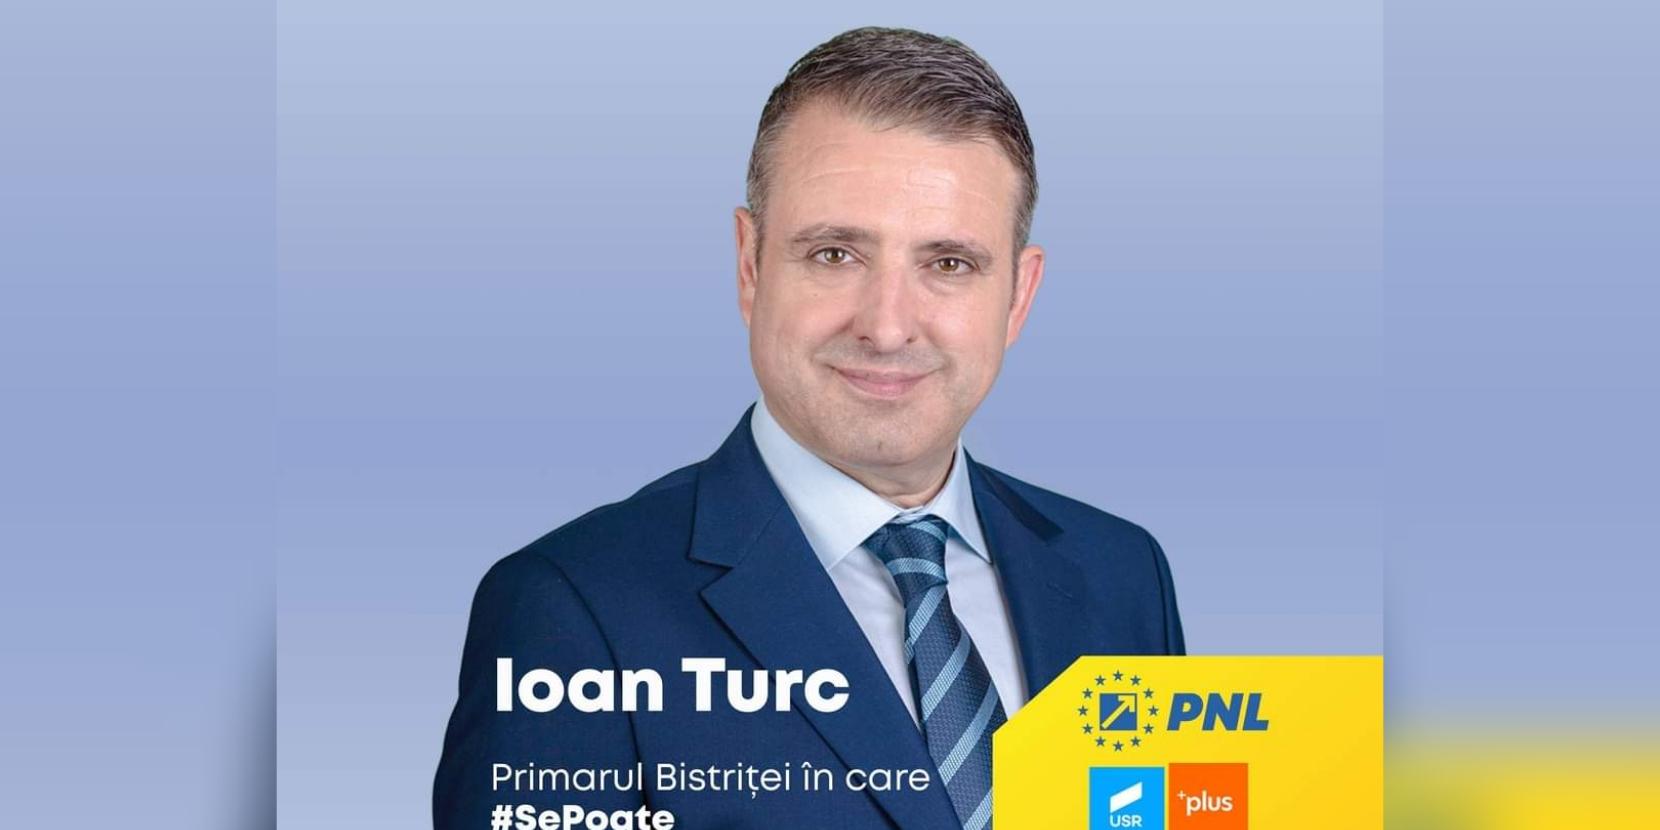 Ioan Turc